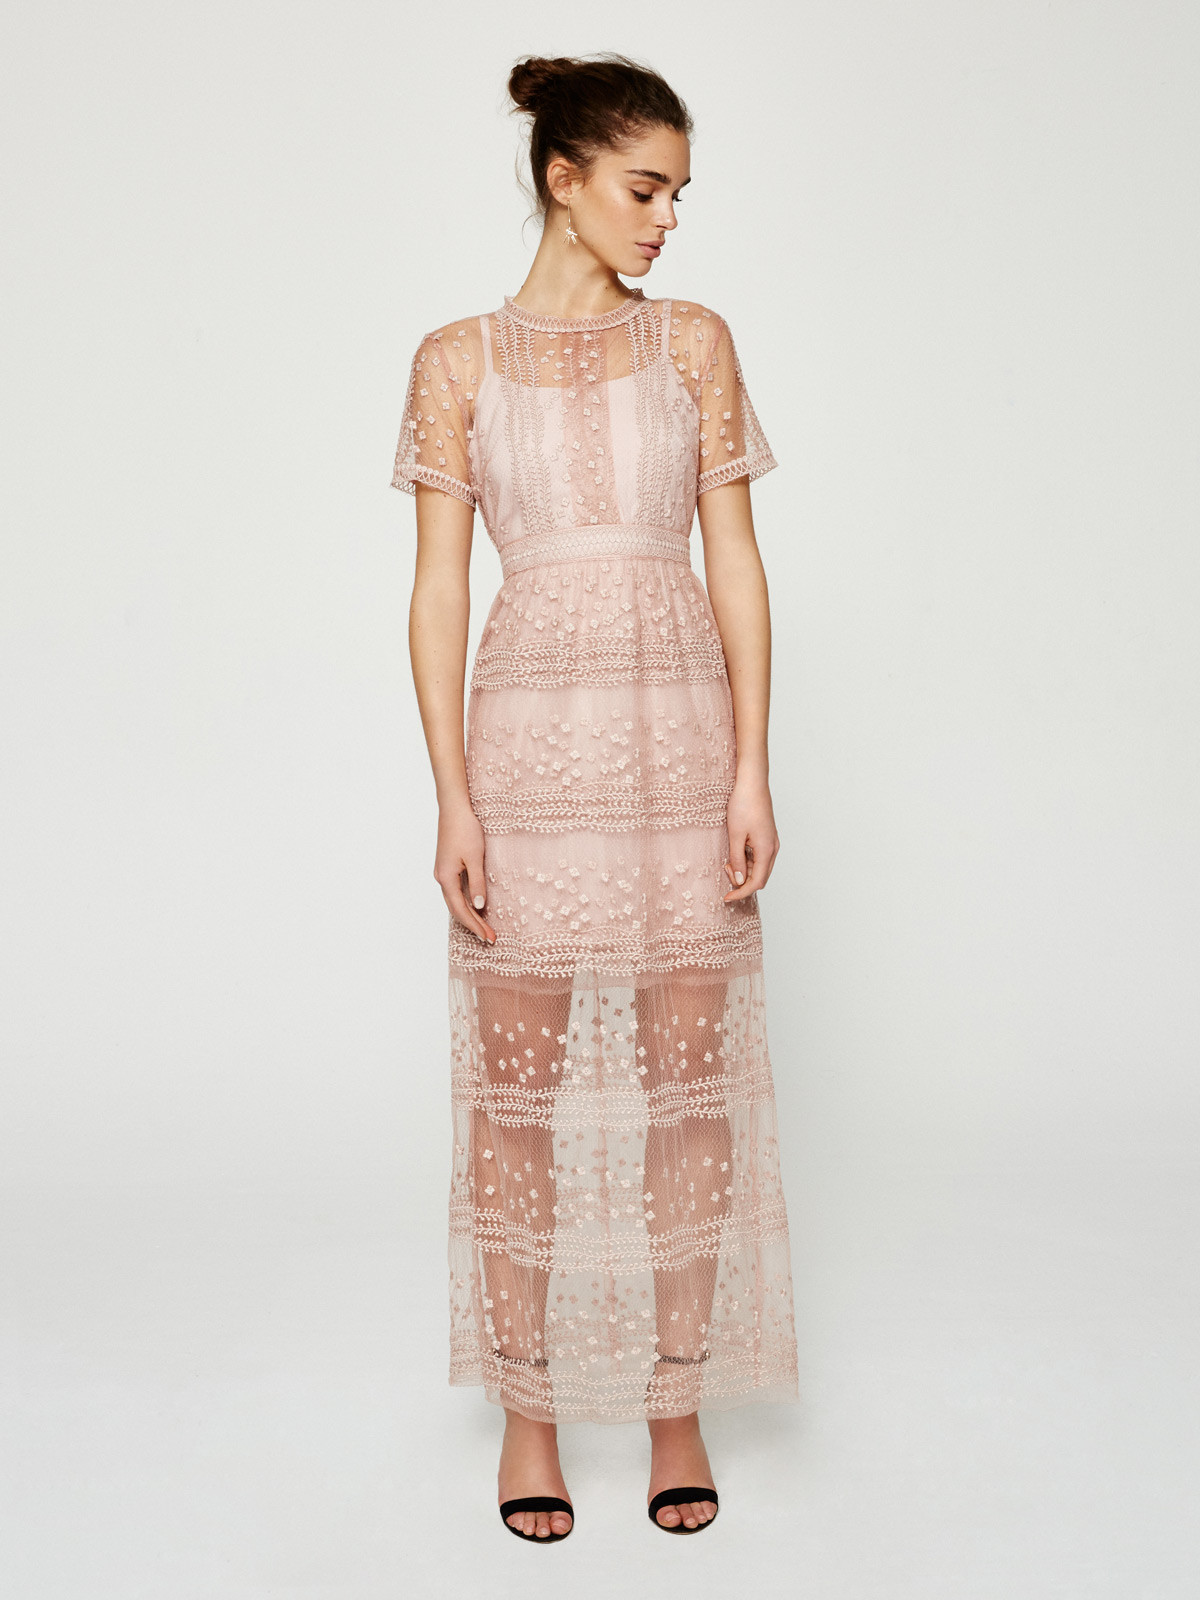 estromboli-vestido-largo-rosa-cuarzo-bordado-de-mioh-1